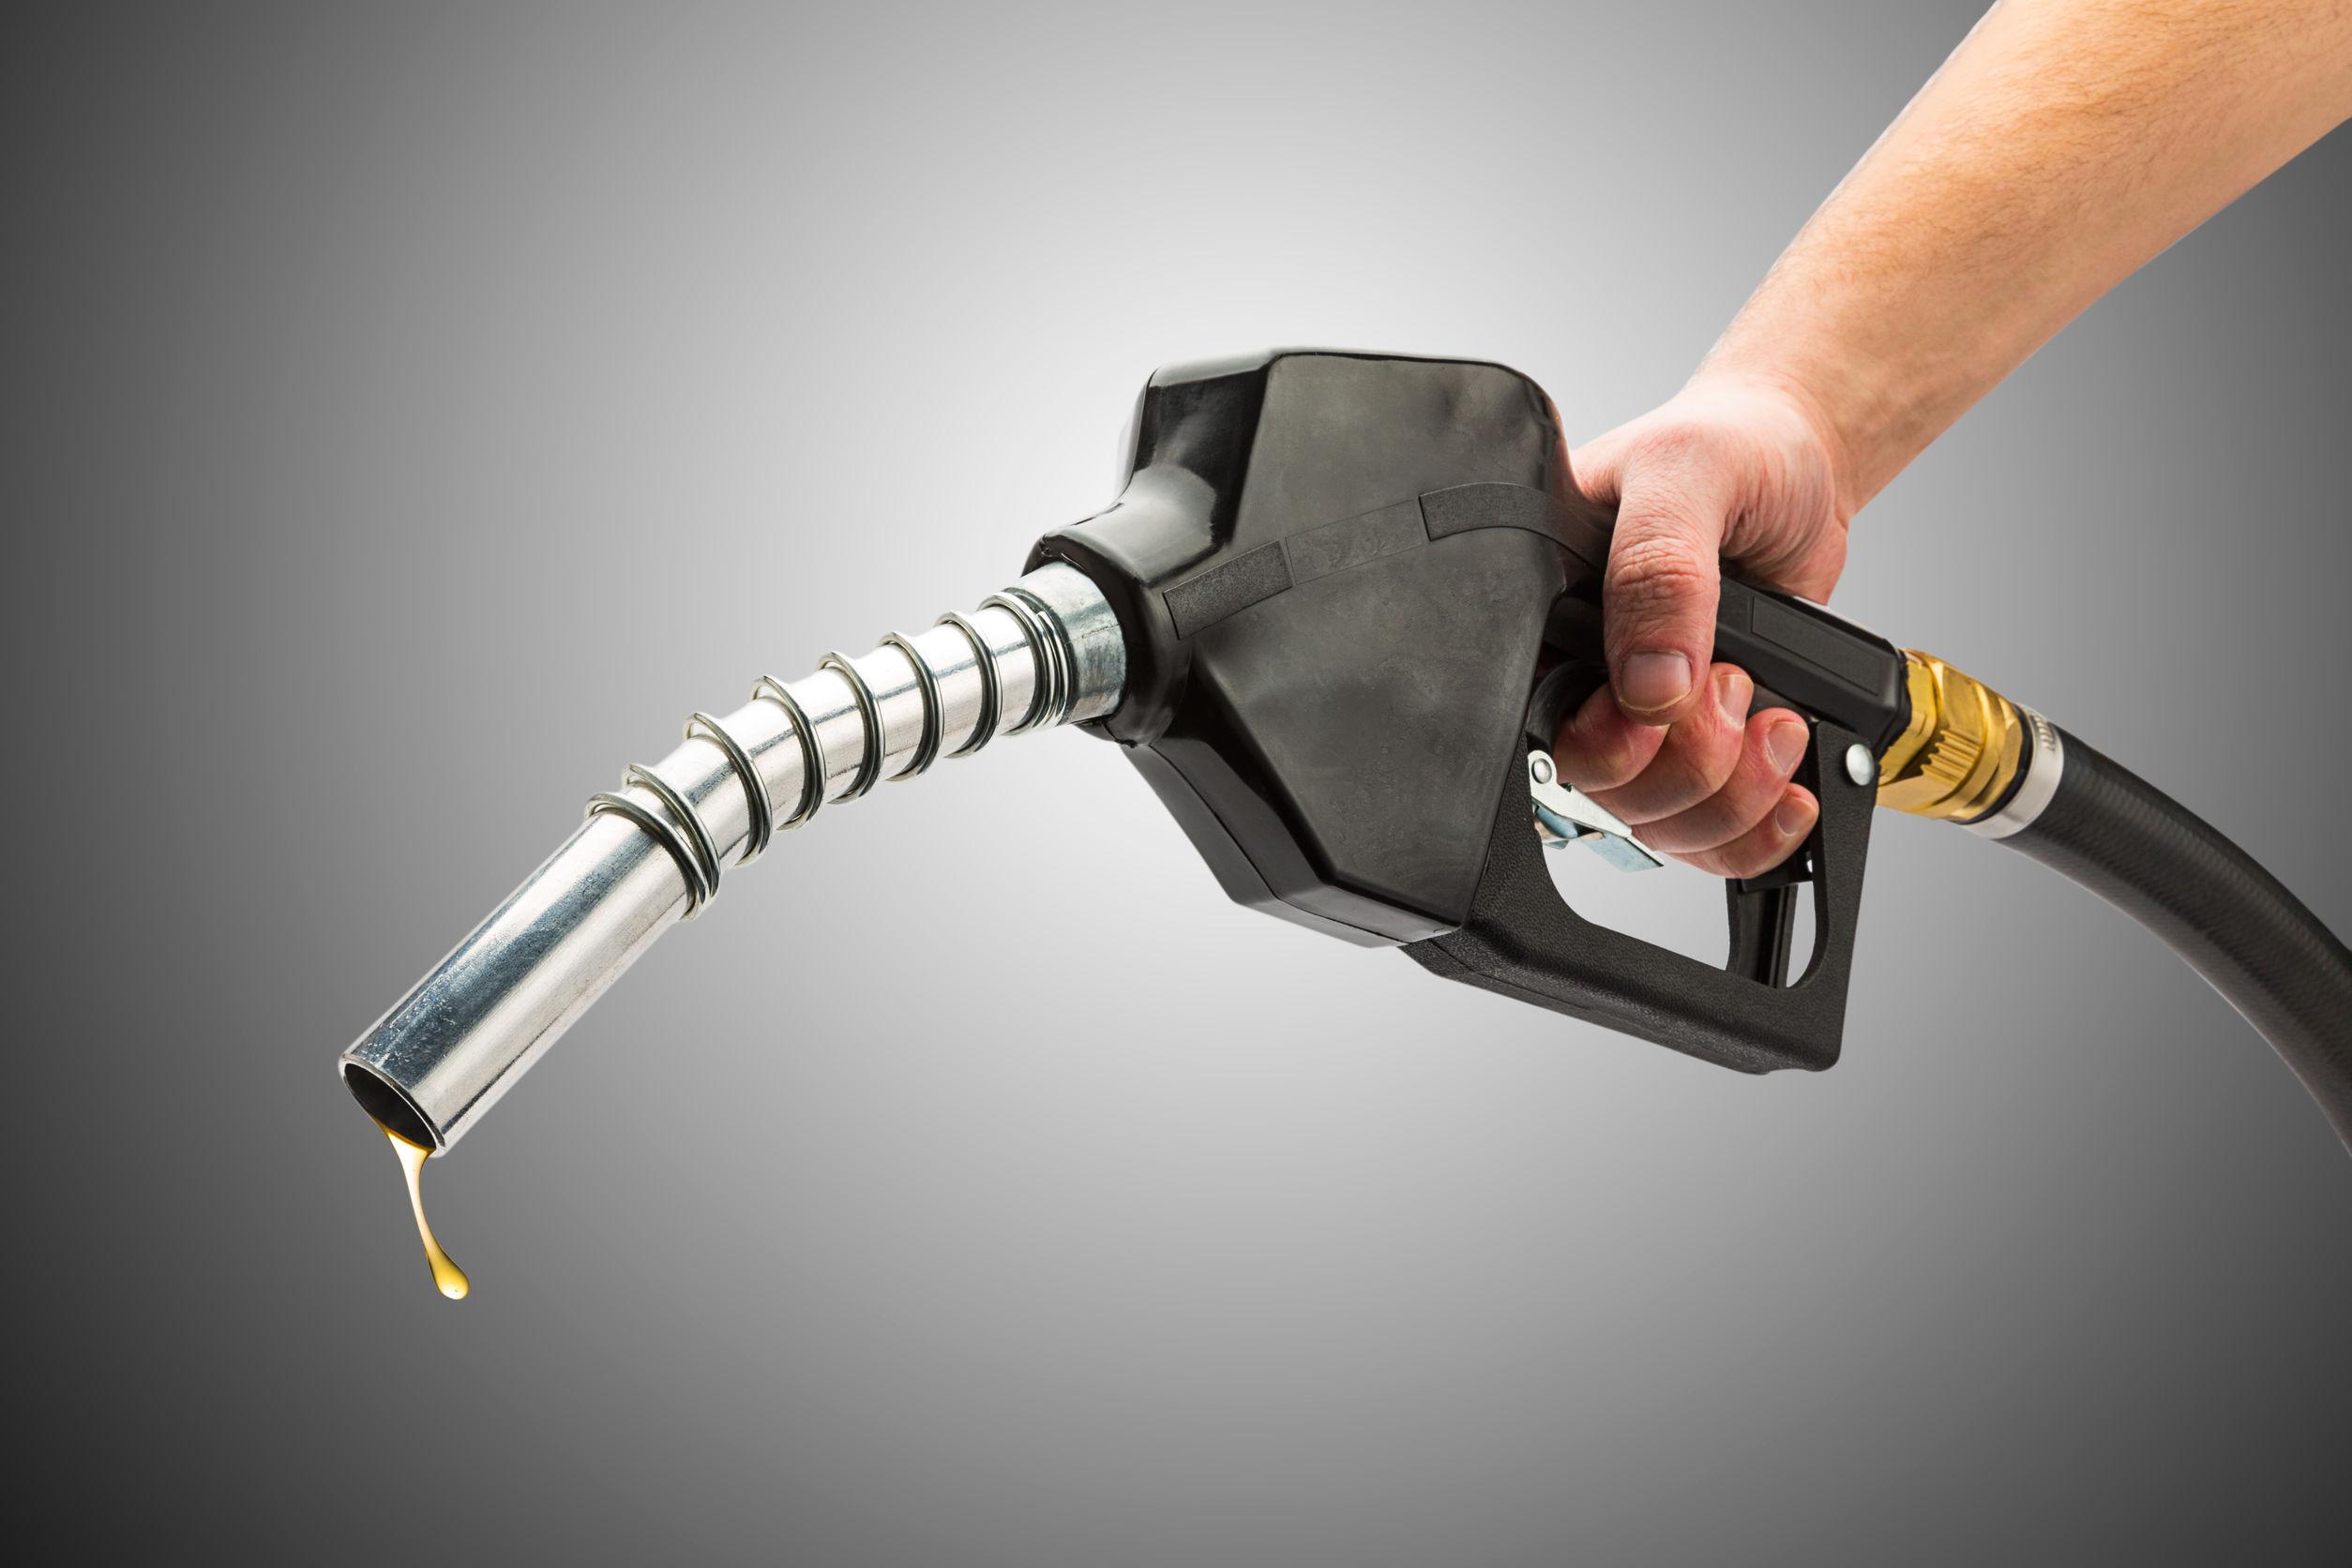 Centro Unido y Peerless Oil reparten diesel gratis